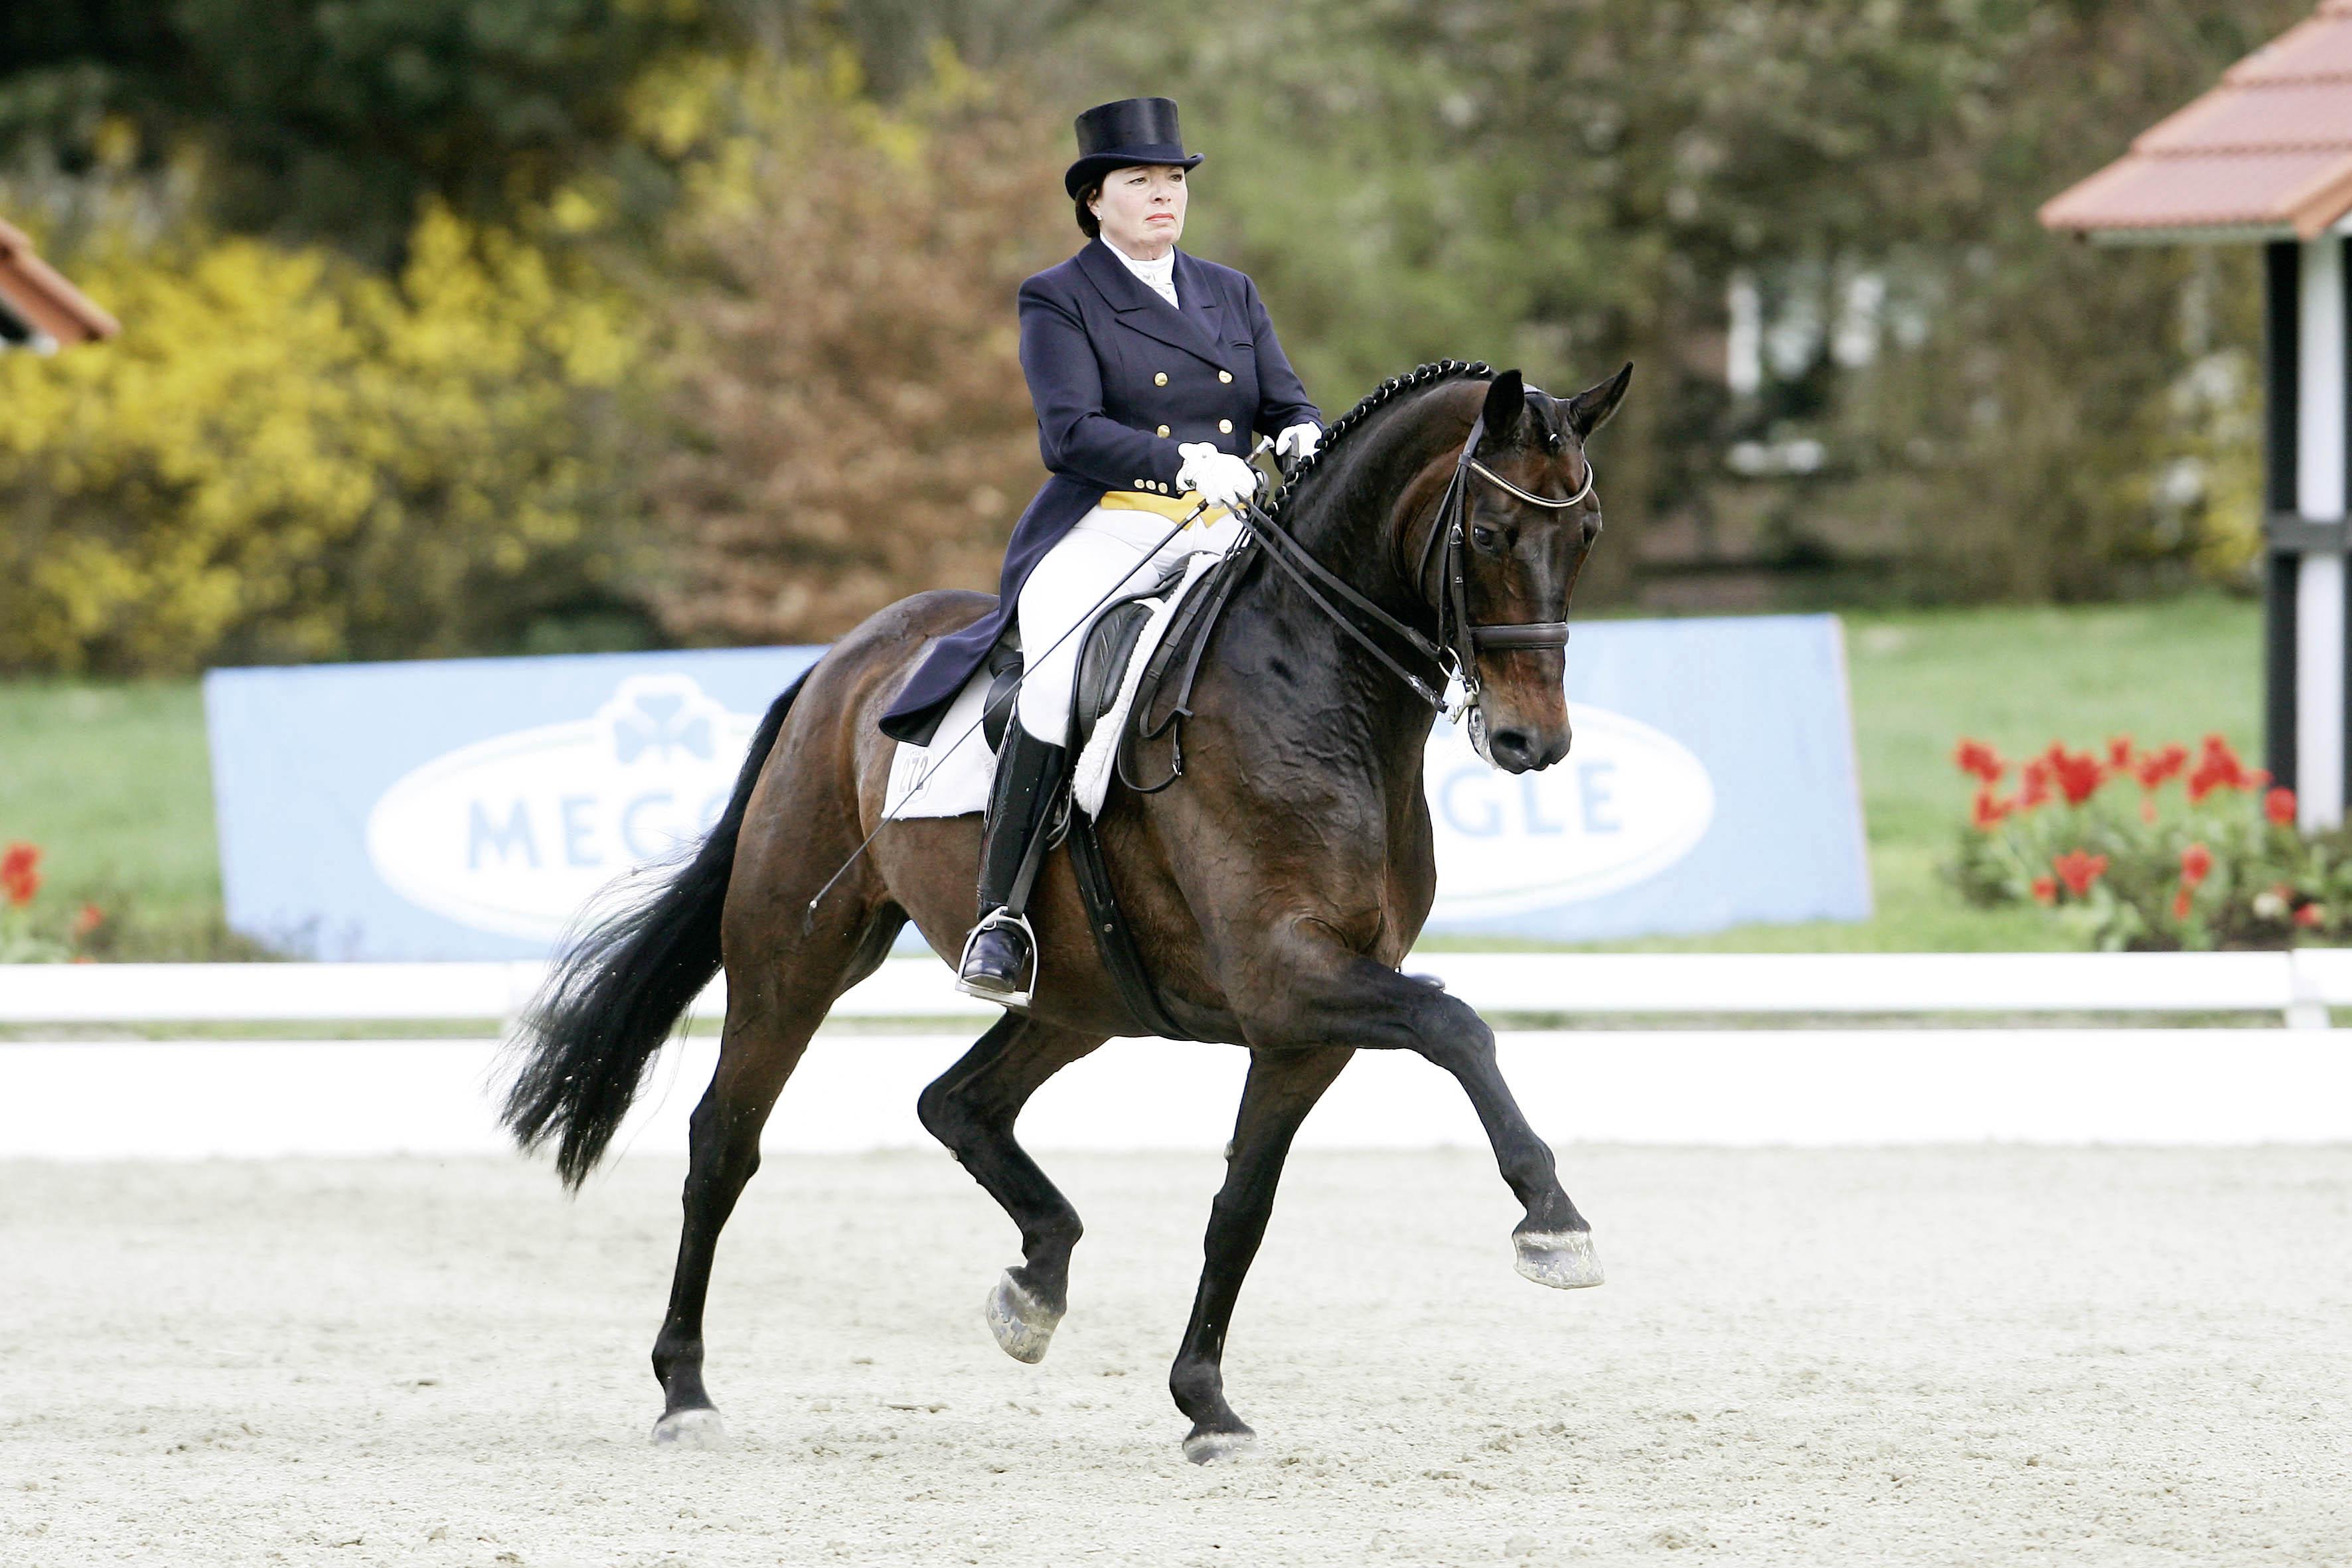 Equestrian - djockey Kasselmann